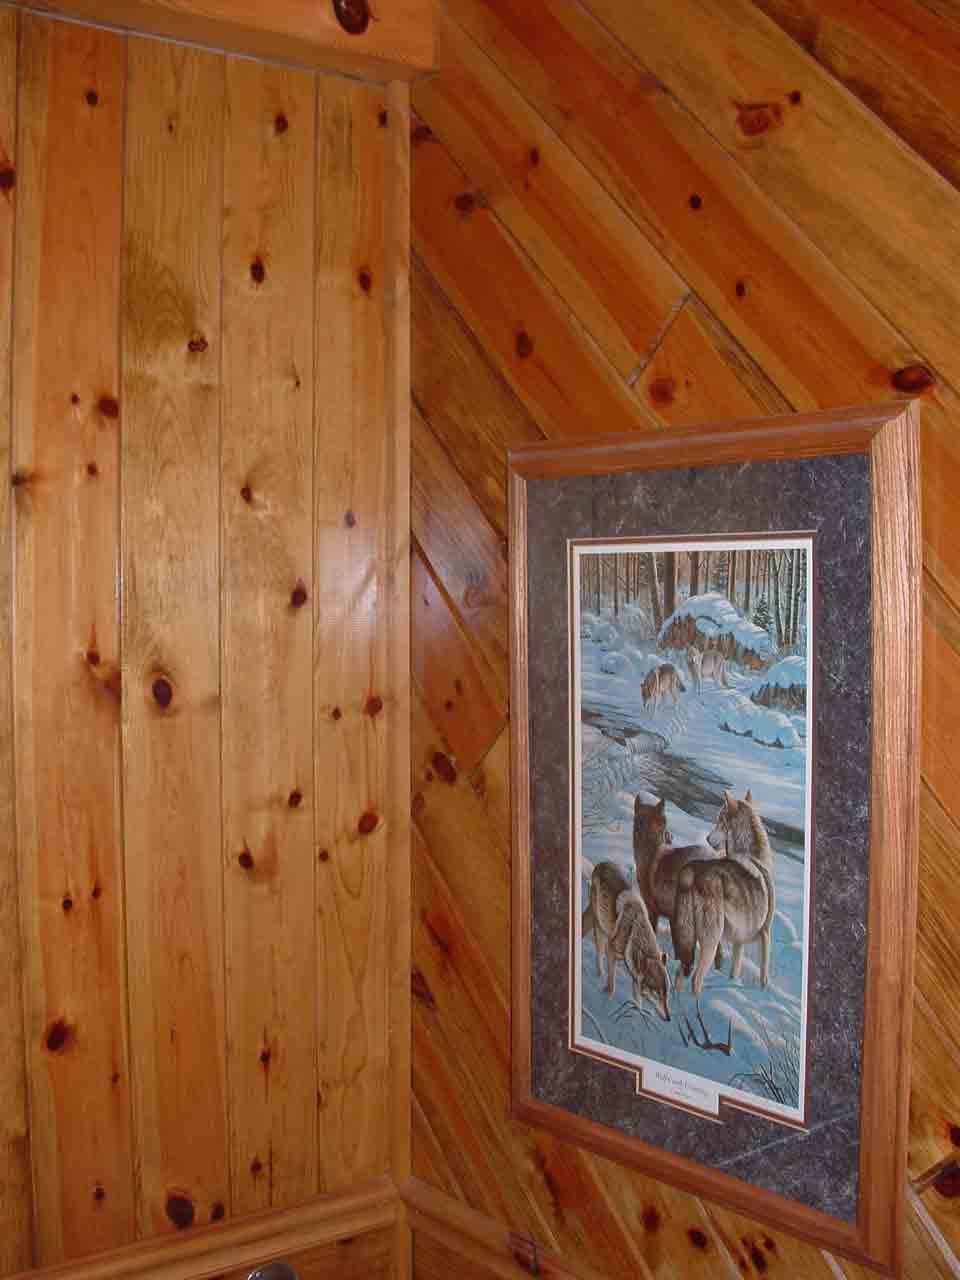 3x8 log siding hand hewn pine - 3x8 Log Siding Hand Hewn Pine 41